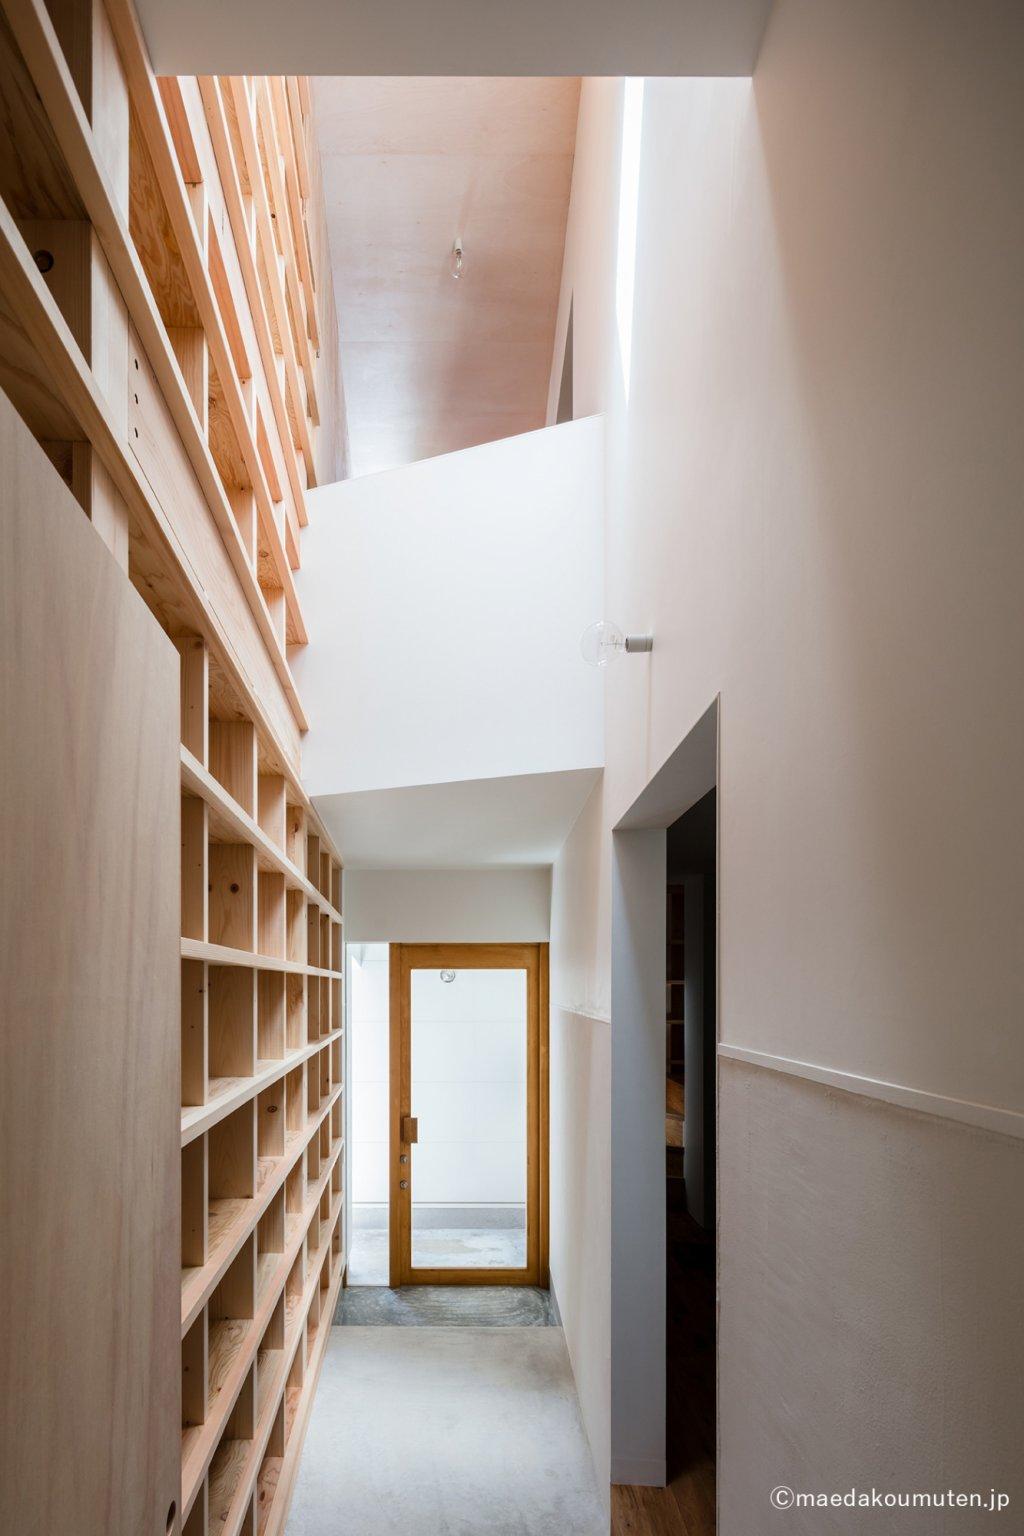 神奈川、工務店、注文住宅、デザイン住宅、建築家、亀井野の家、11